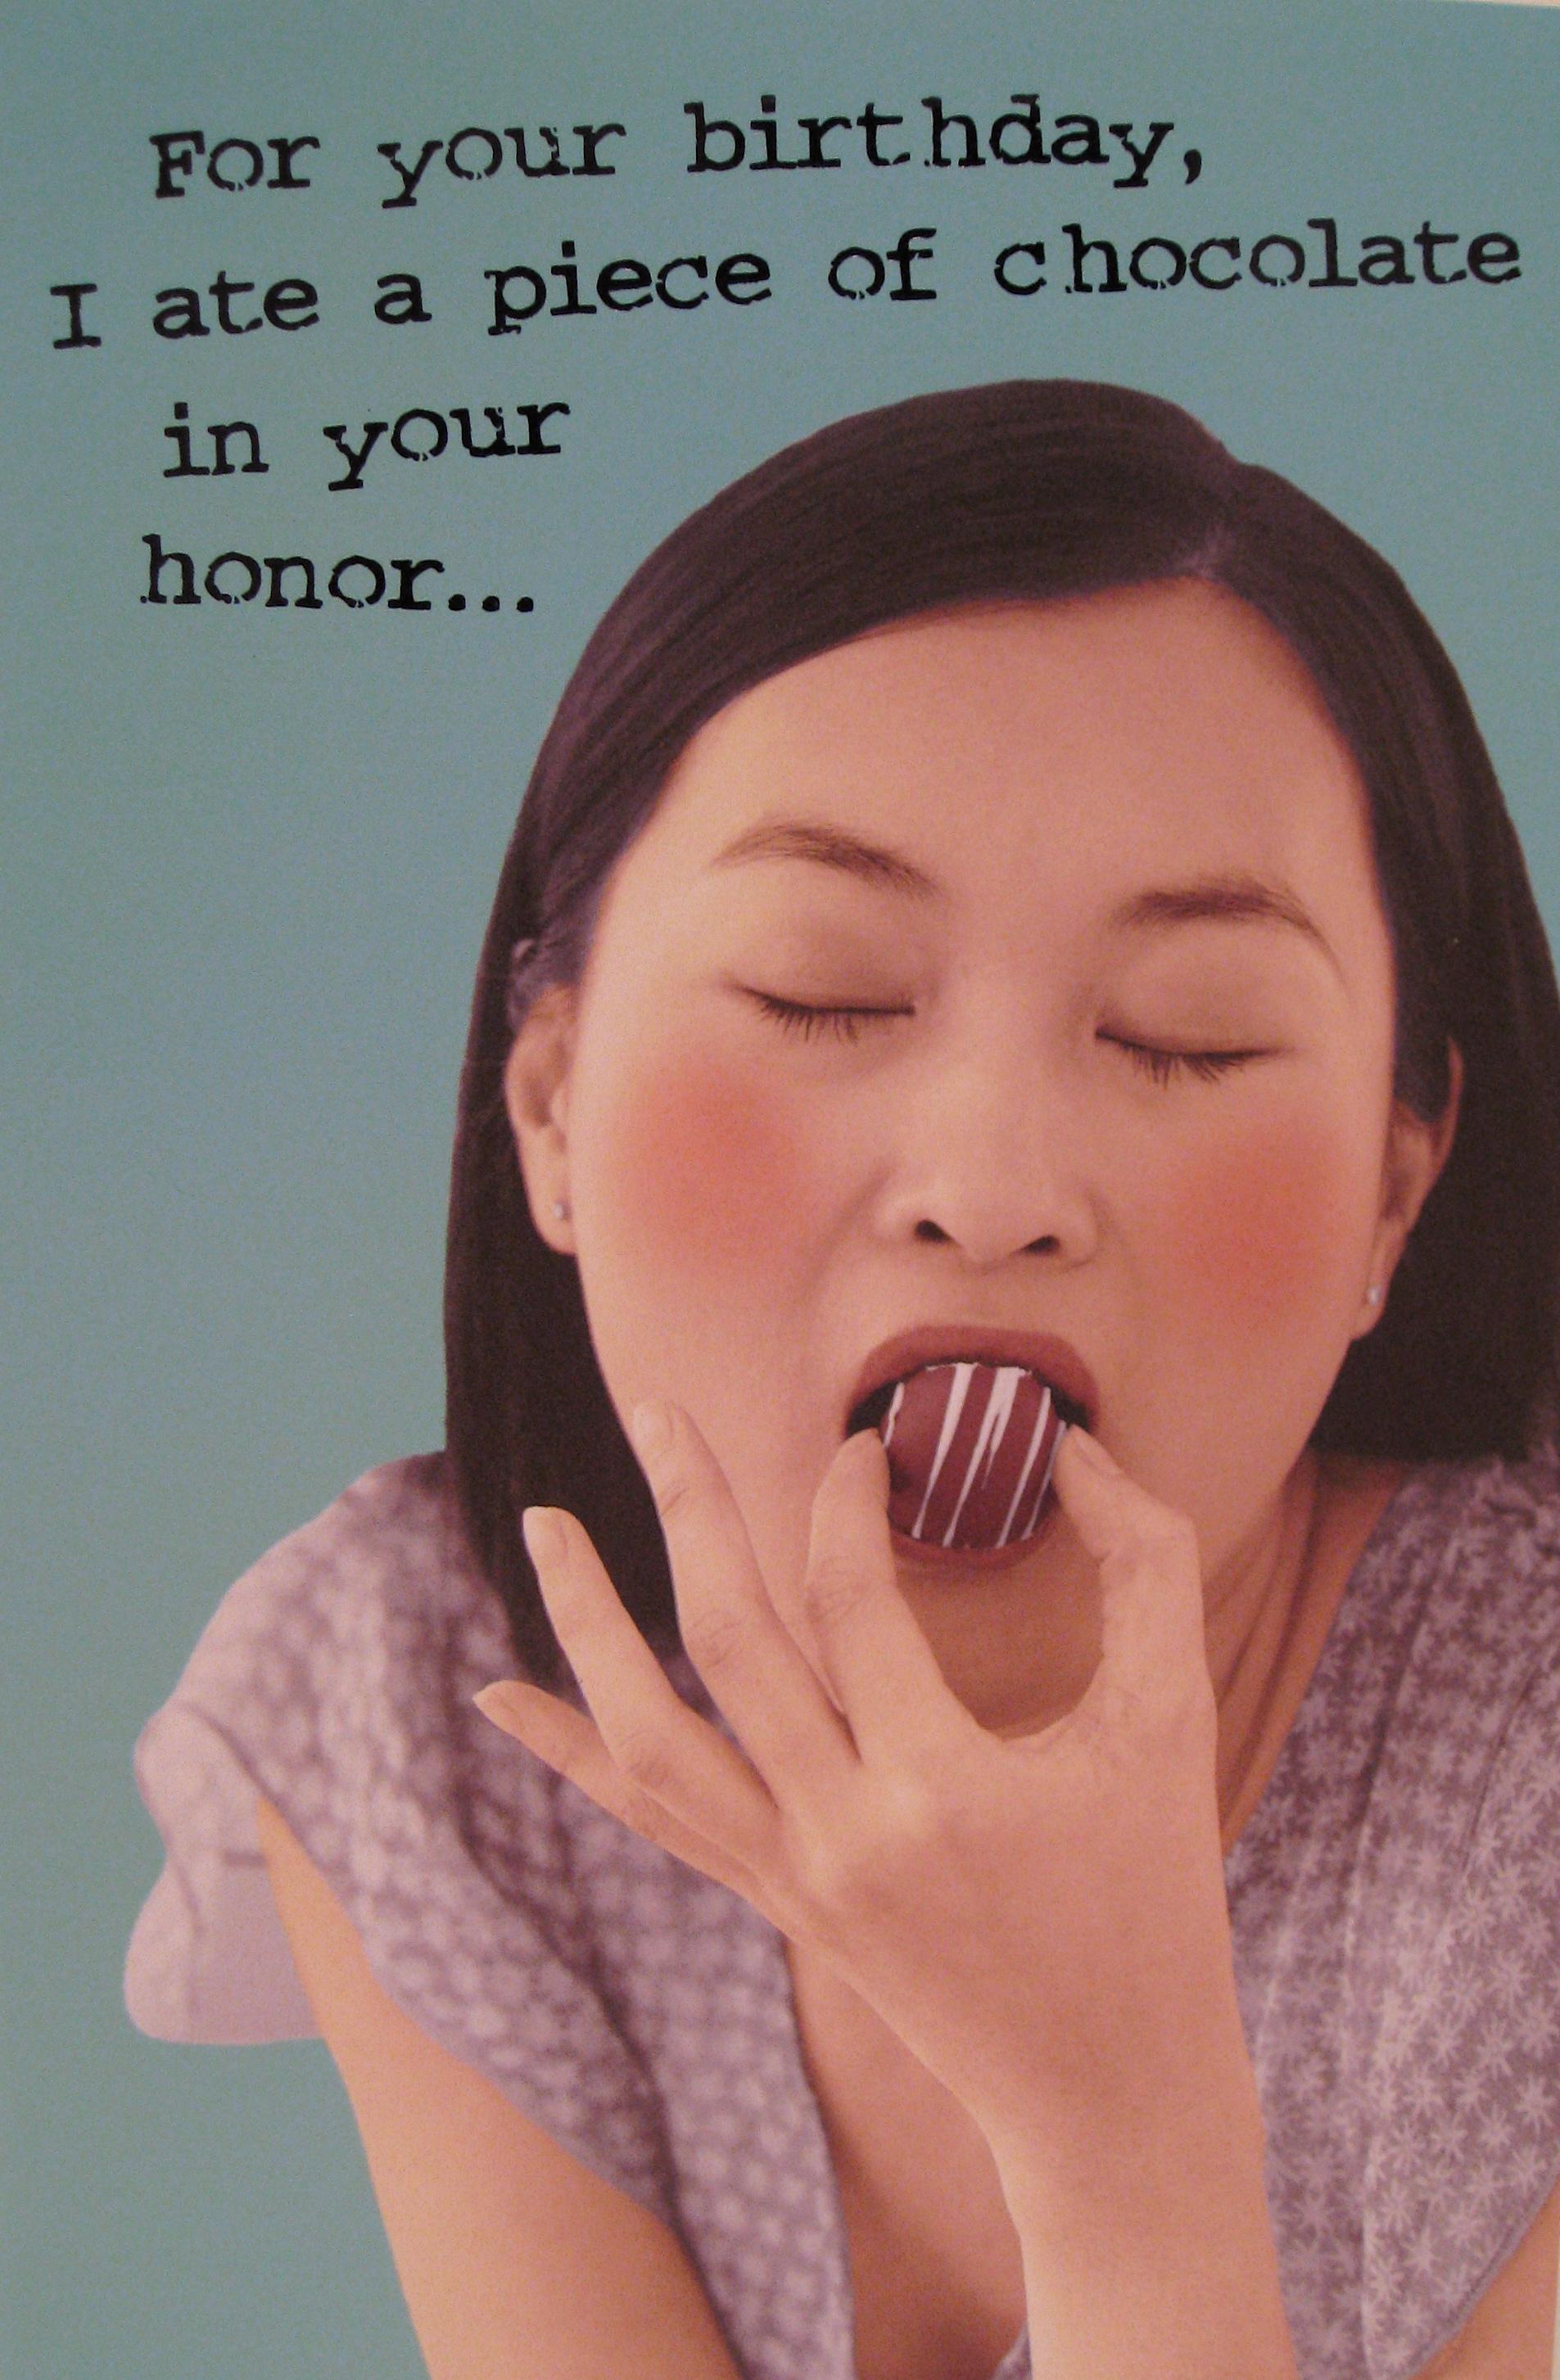 chocolate-birthday-card.jpg